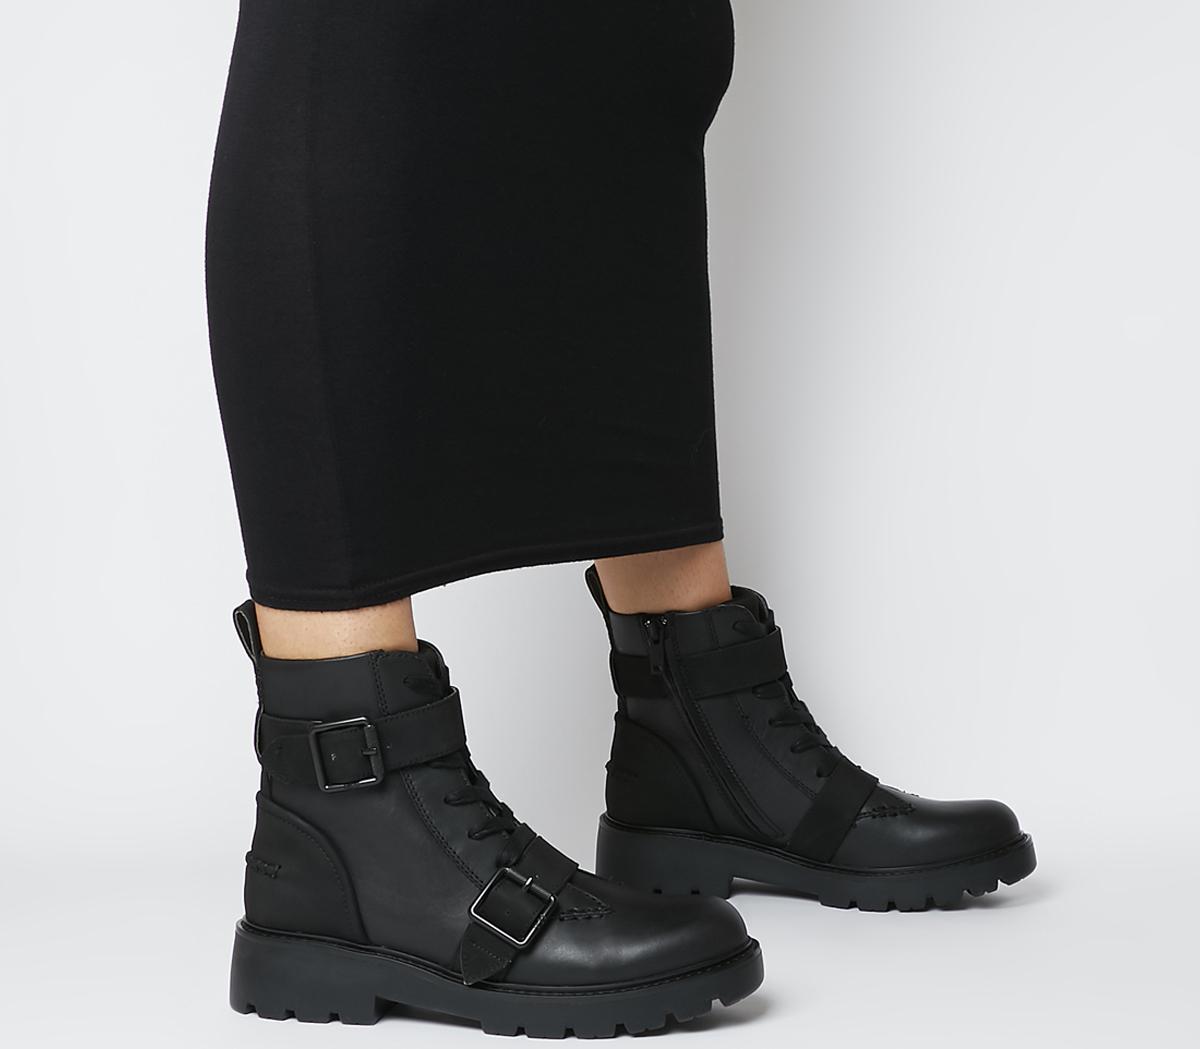 Noe Boots